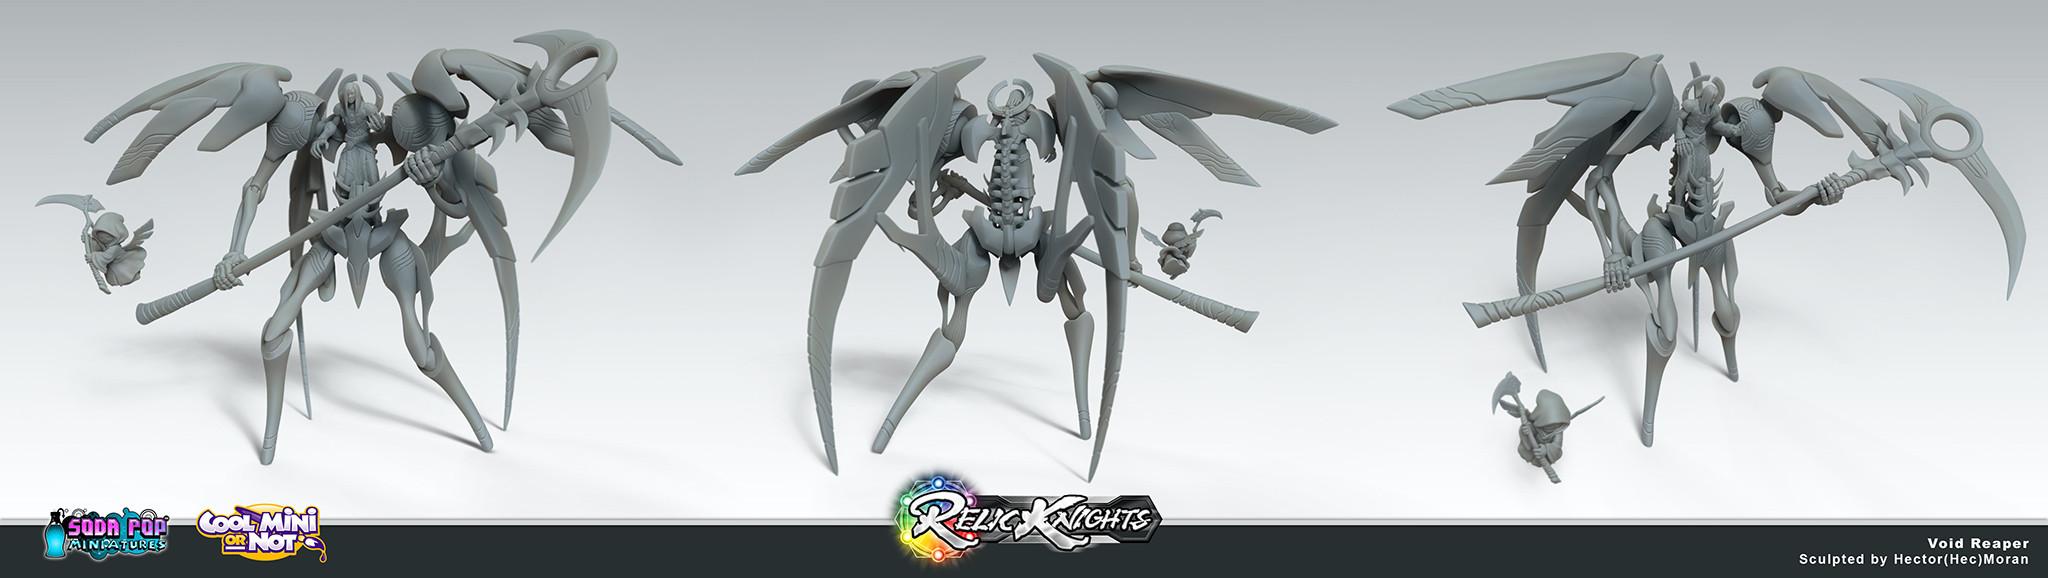 Void Reaper Harbonath